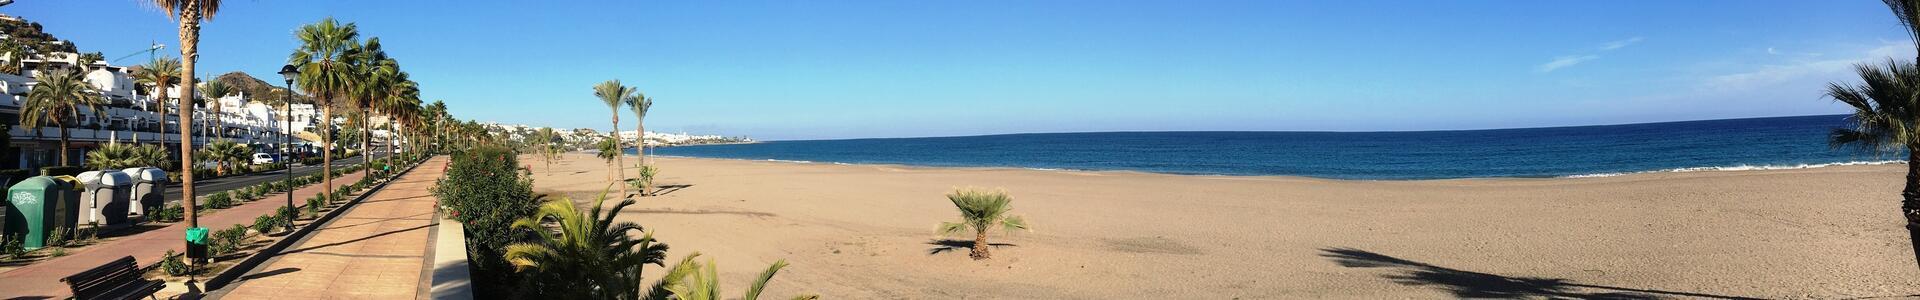 Playa Las Ventanicas